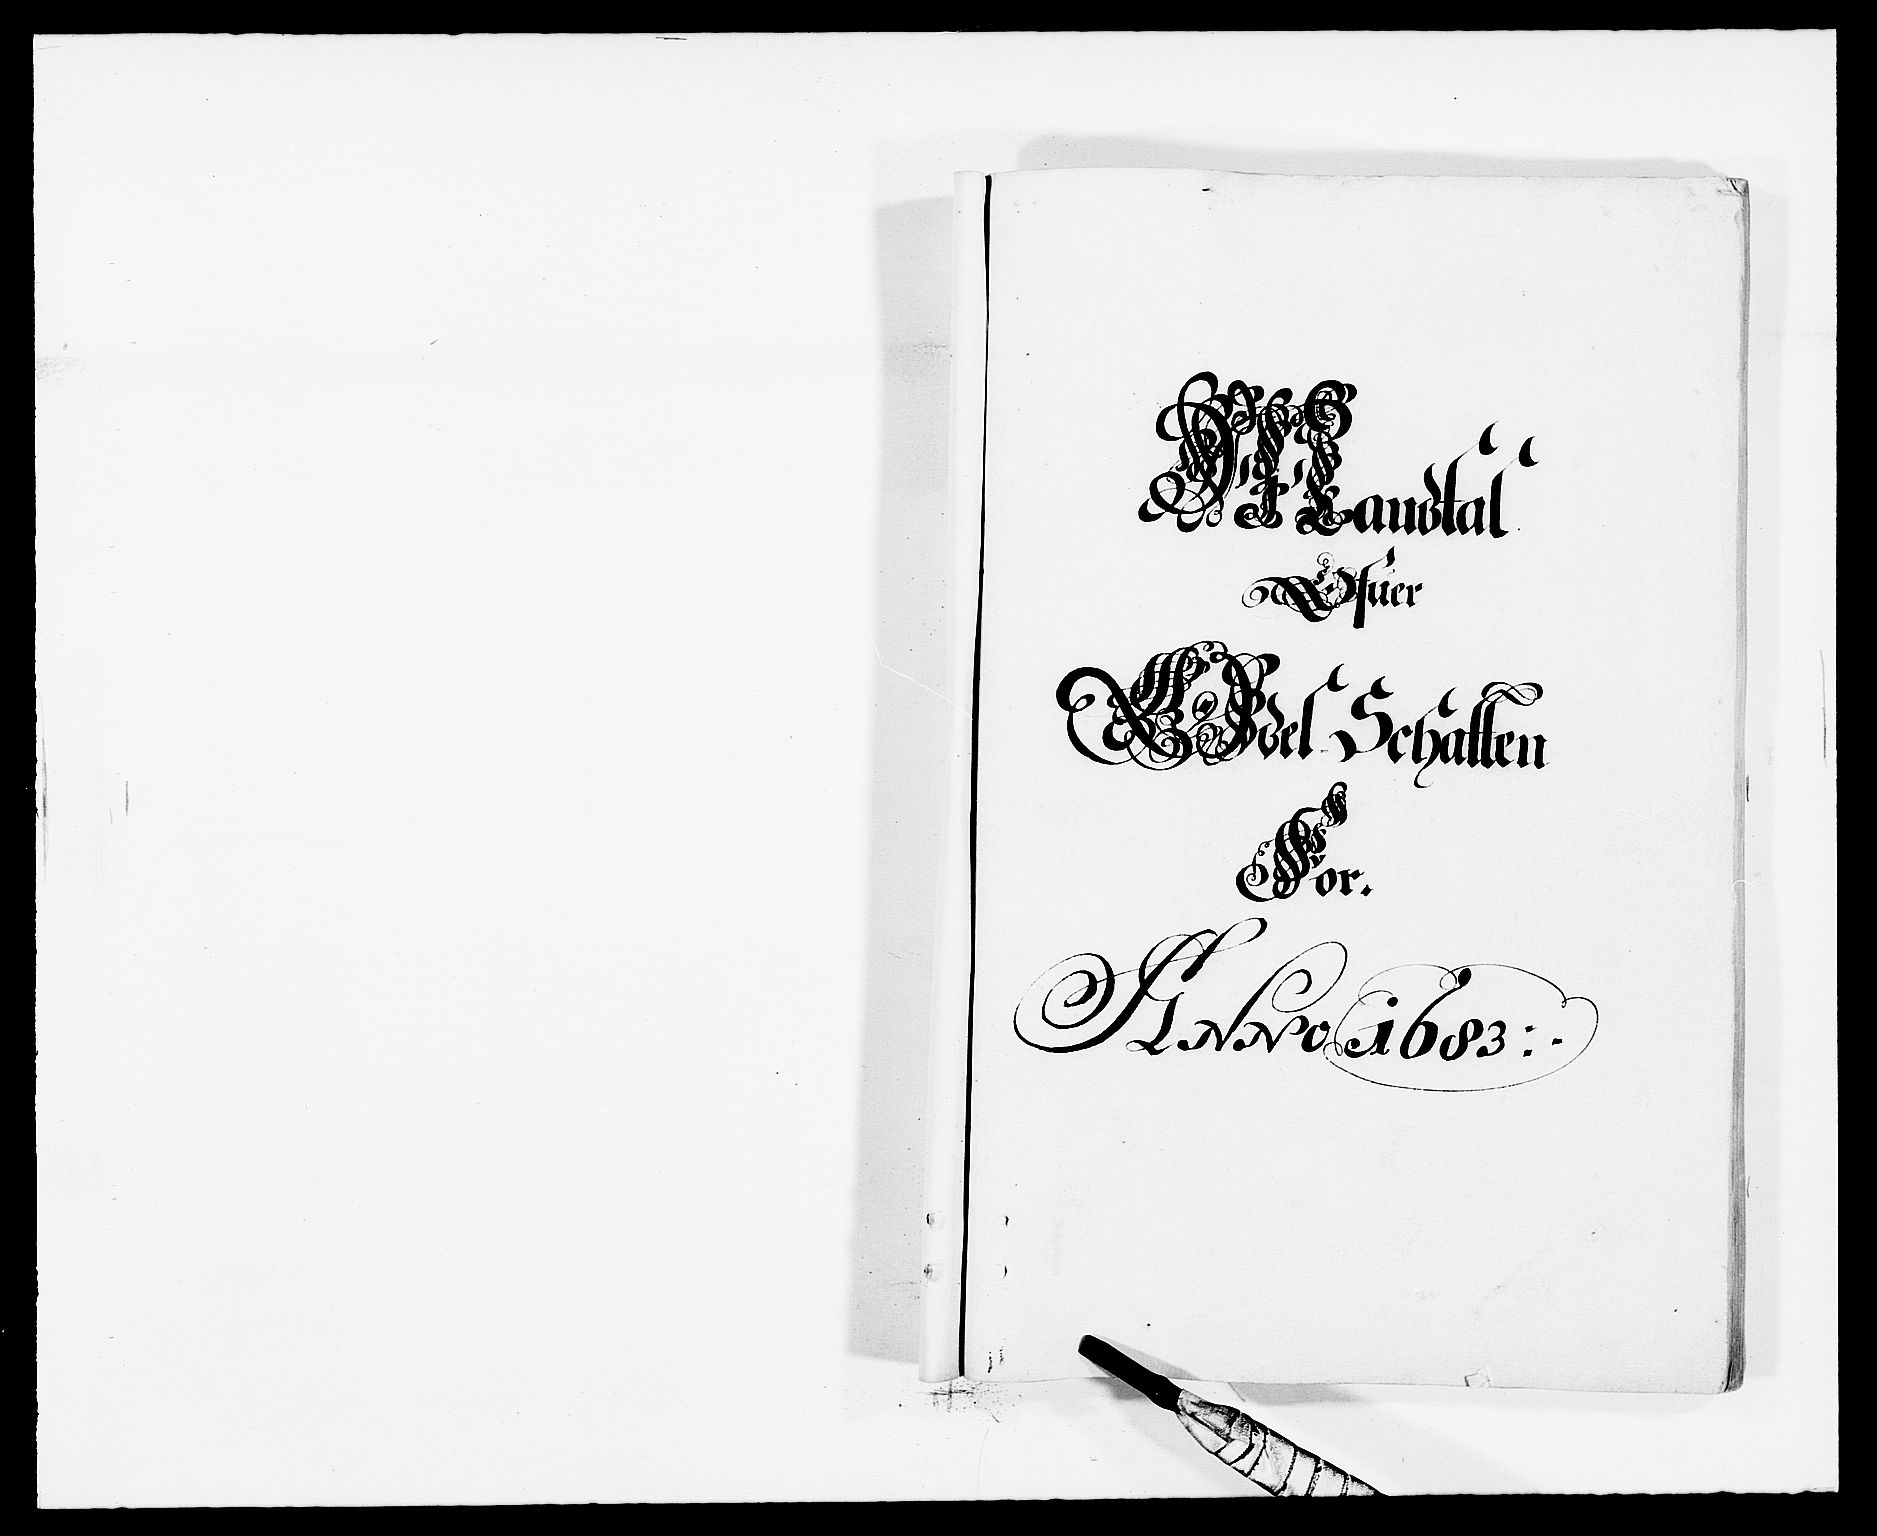 RA, Rentekammeret inntil 1814, Reviderte regnskaper, Fogderegnskap, R32/L1852: Fogderegnskap Jarlsberg grevskap, 1683, s. 171